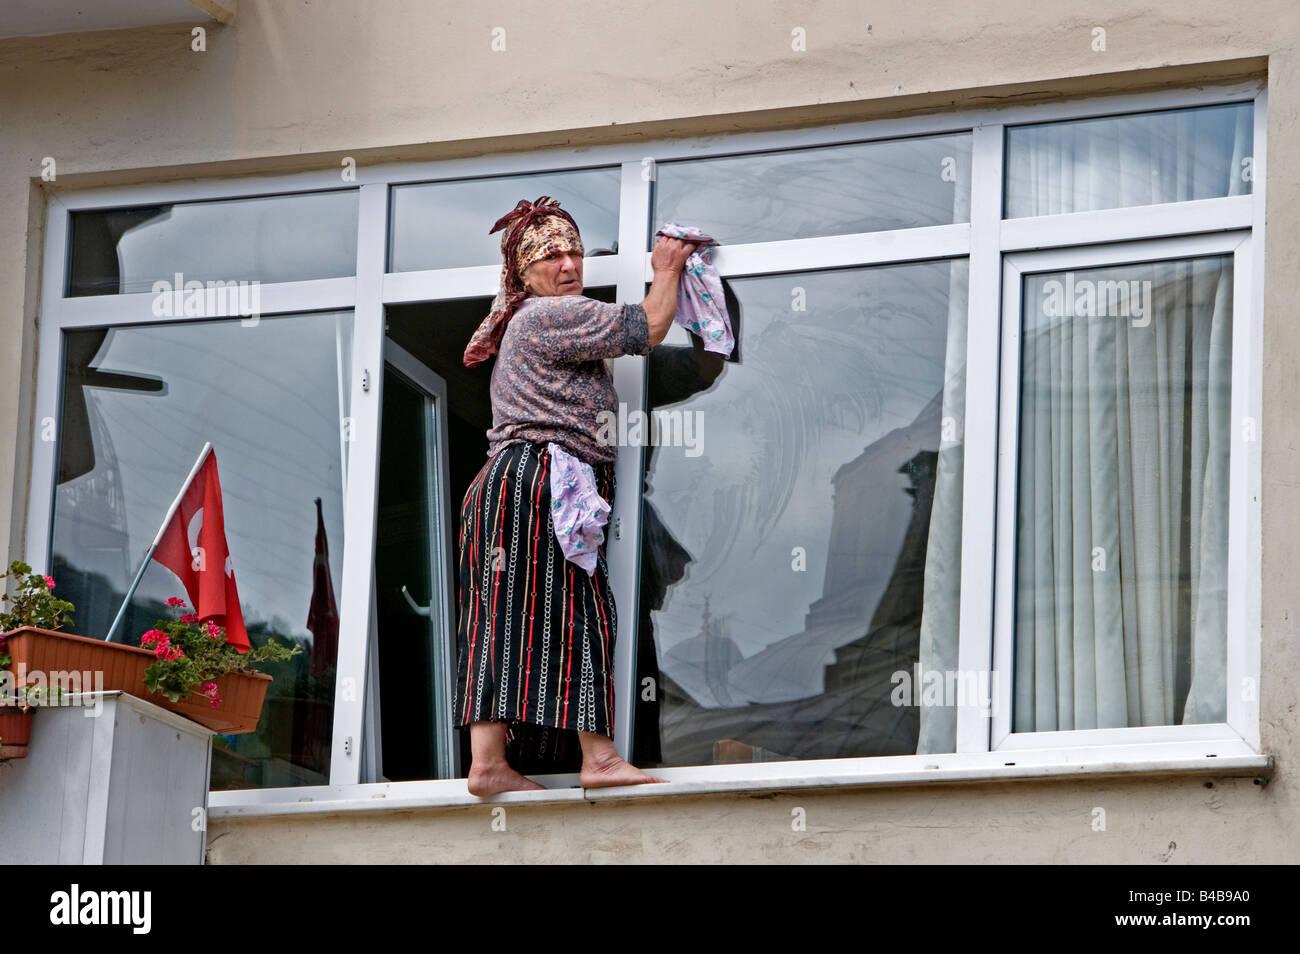 Mujer de la limpieza Istinye limpiadores de ventanas ventana peligrosa, peligrosa, arriesgada, peligrosos Foto de stock